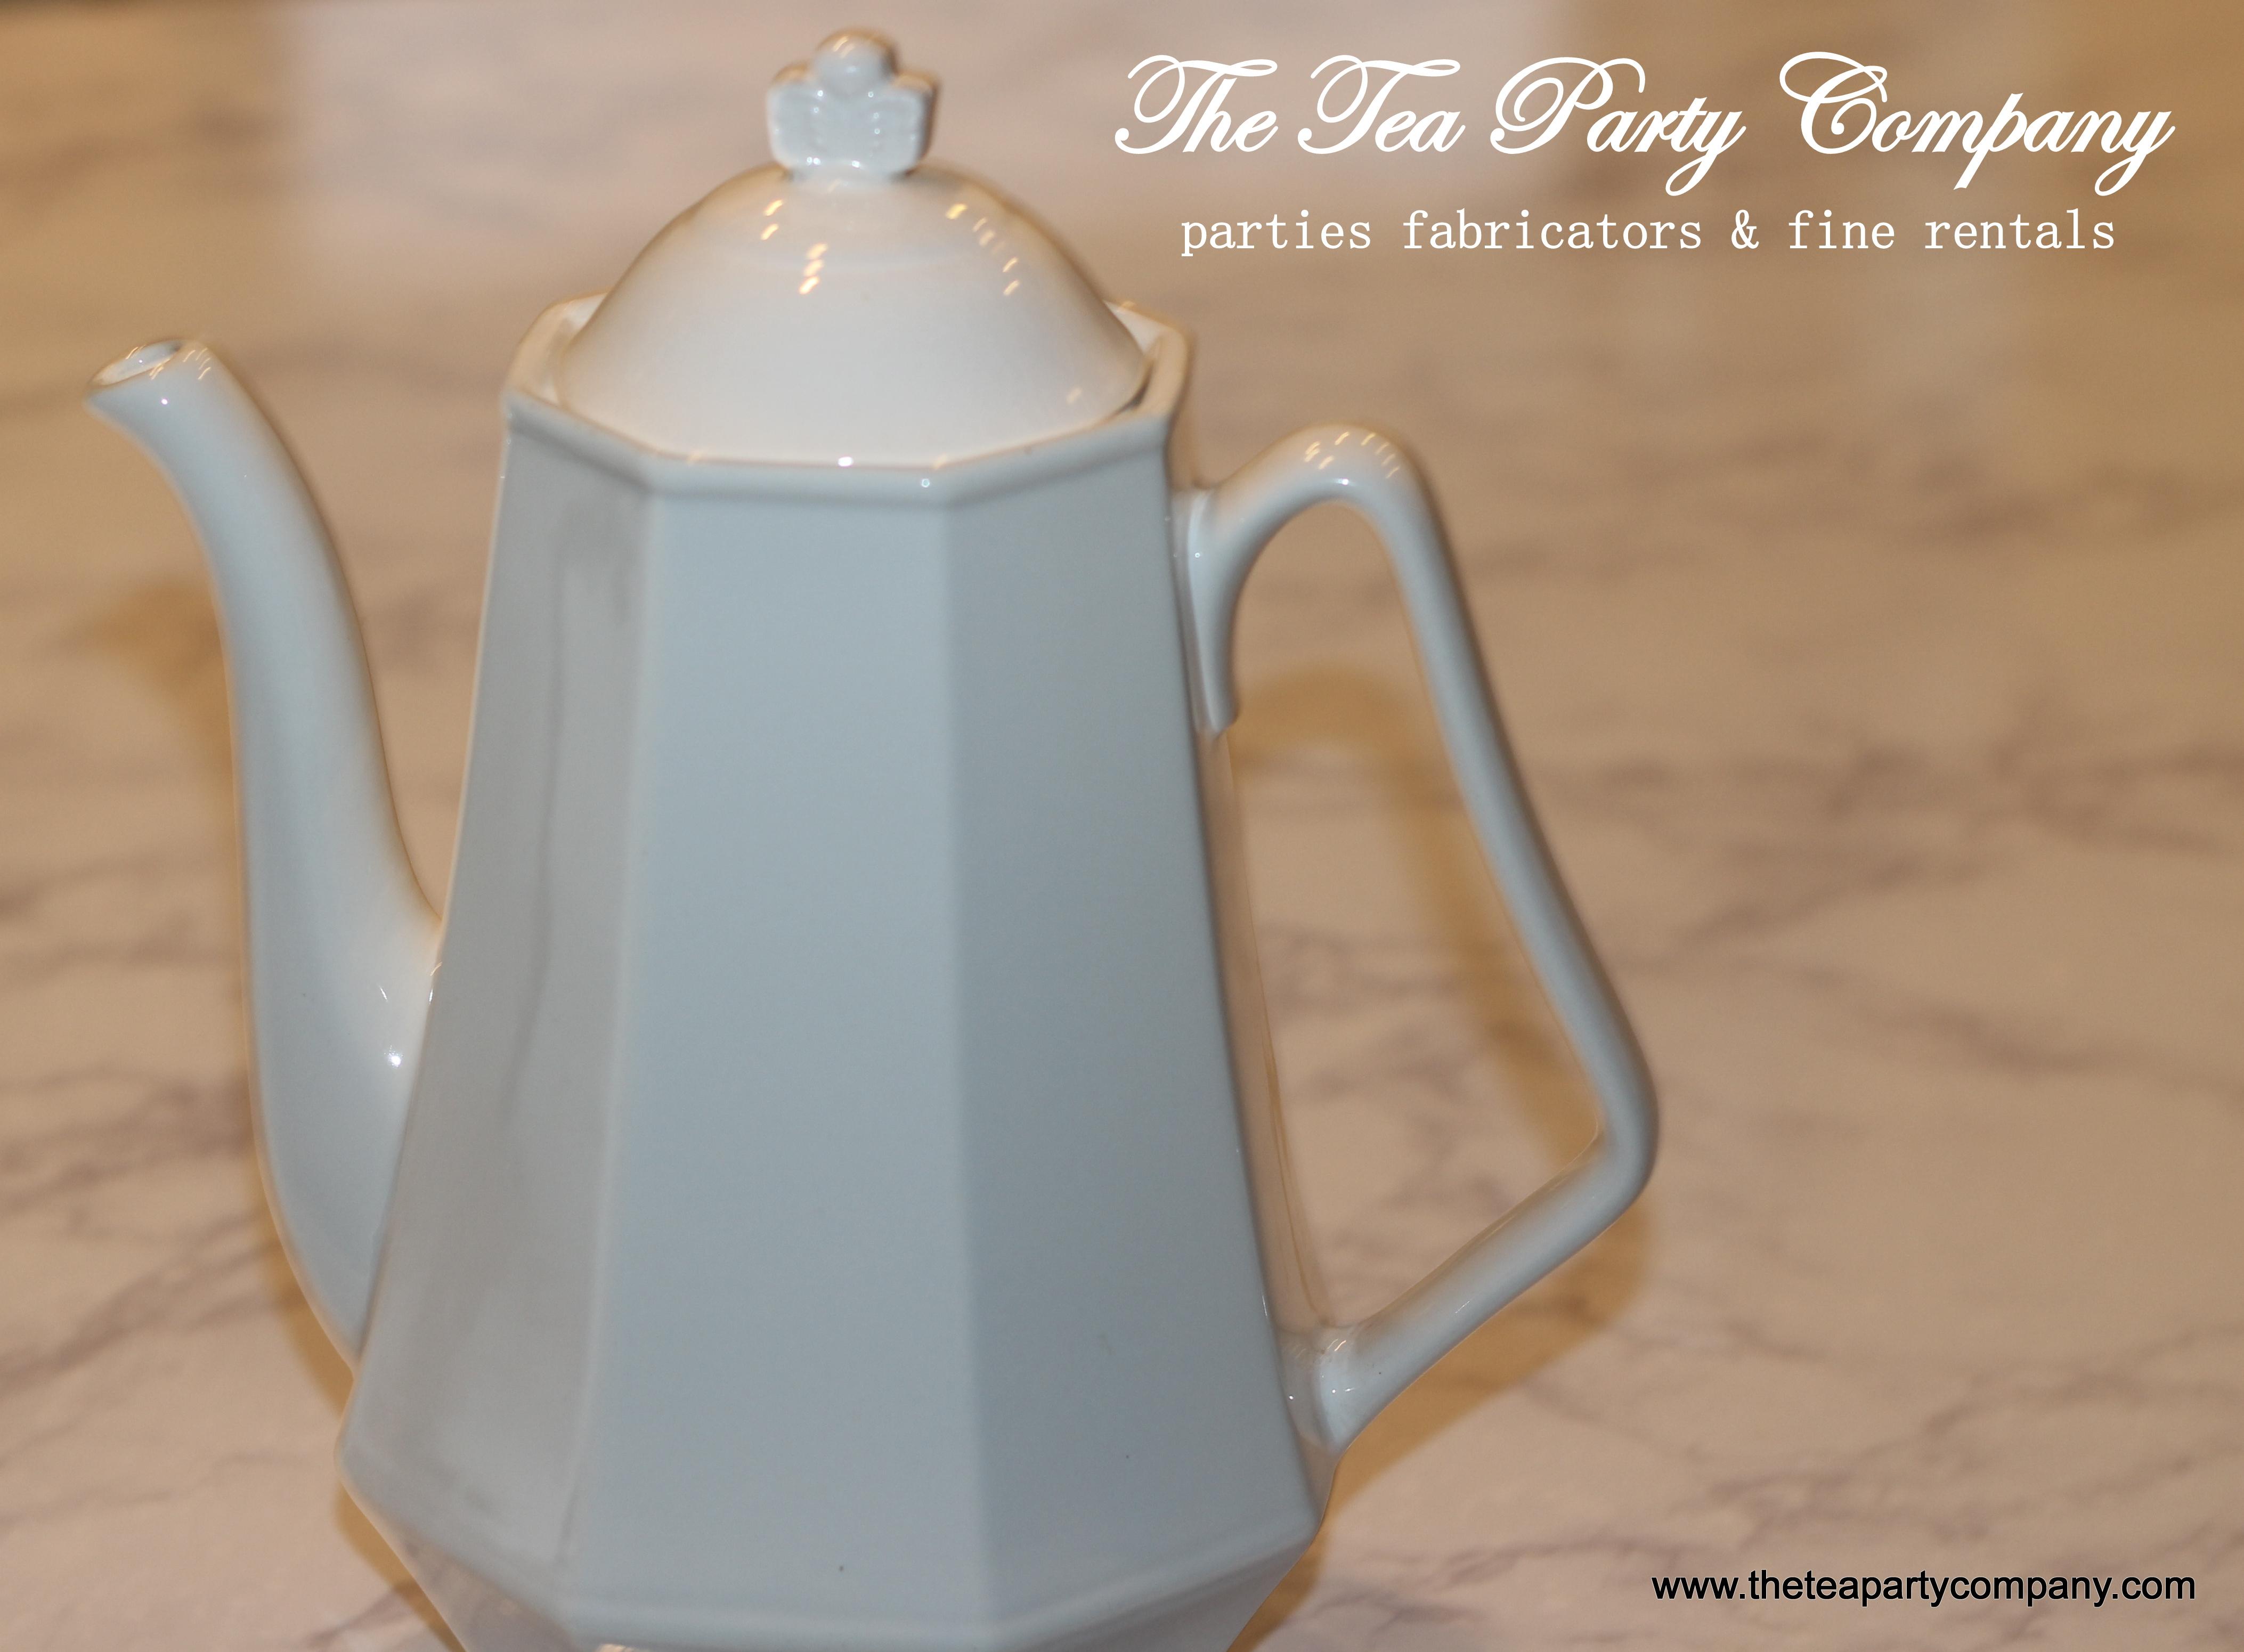 Mismatch Tea Pots The Tea Party Company (7)